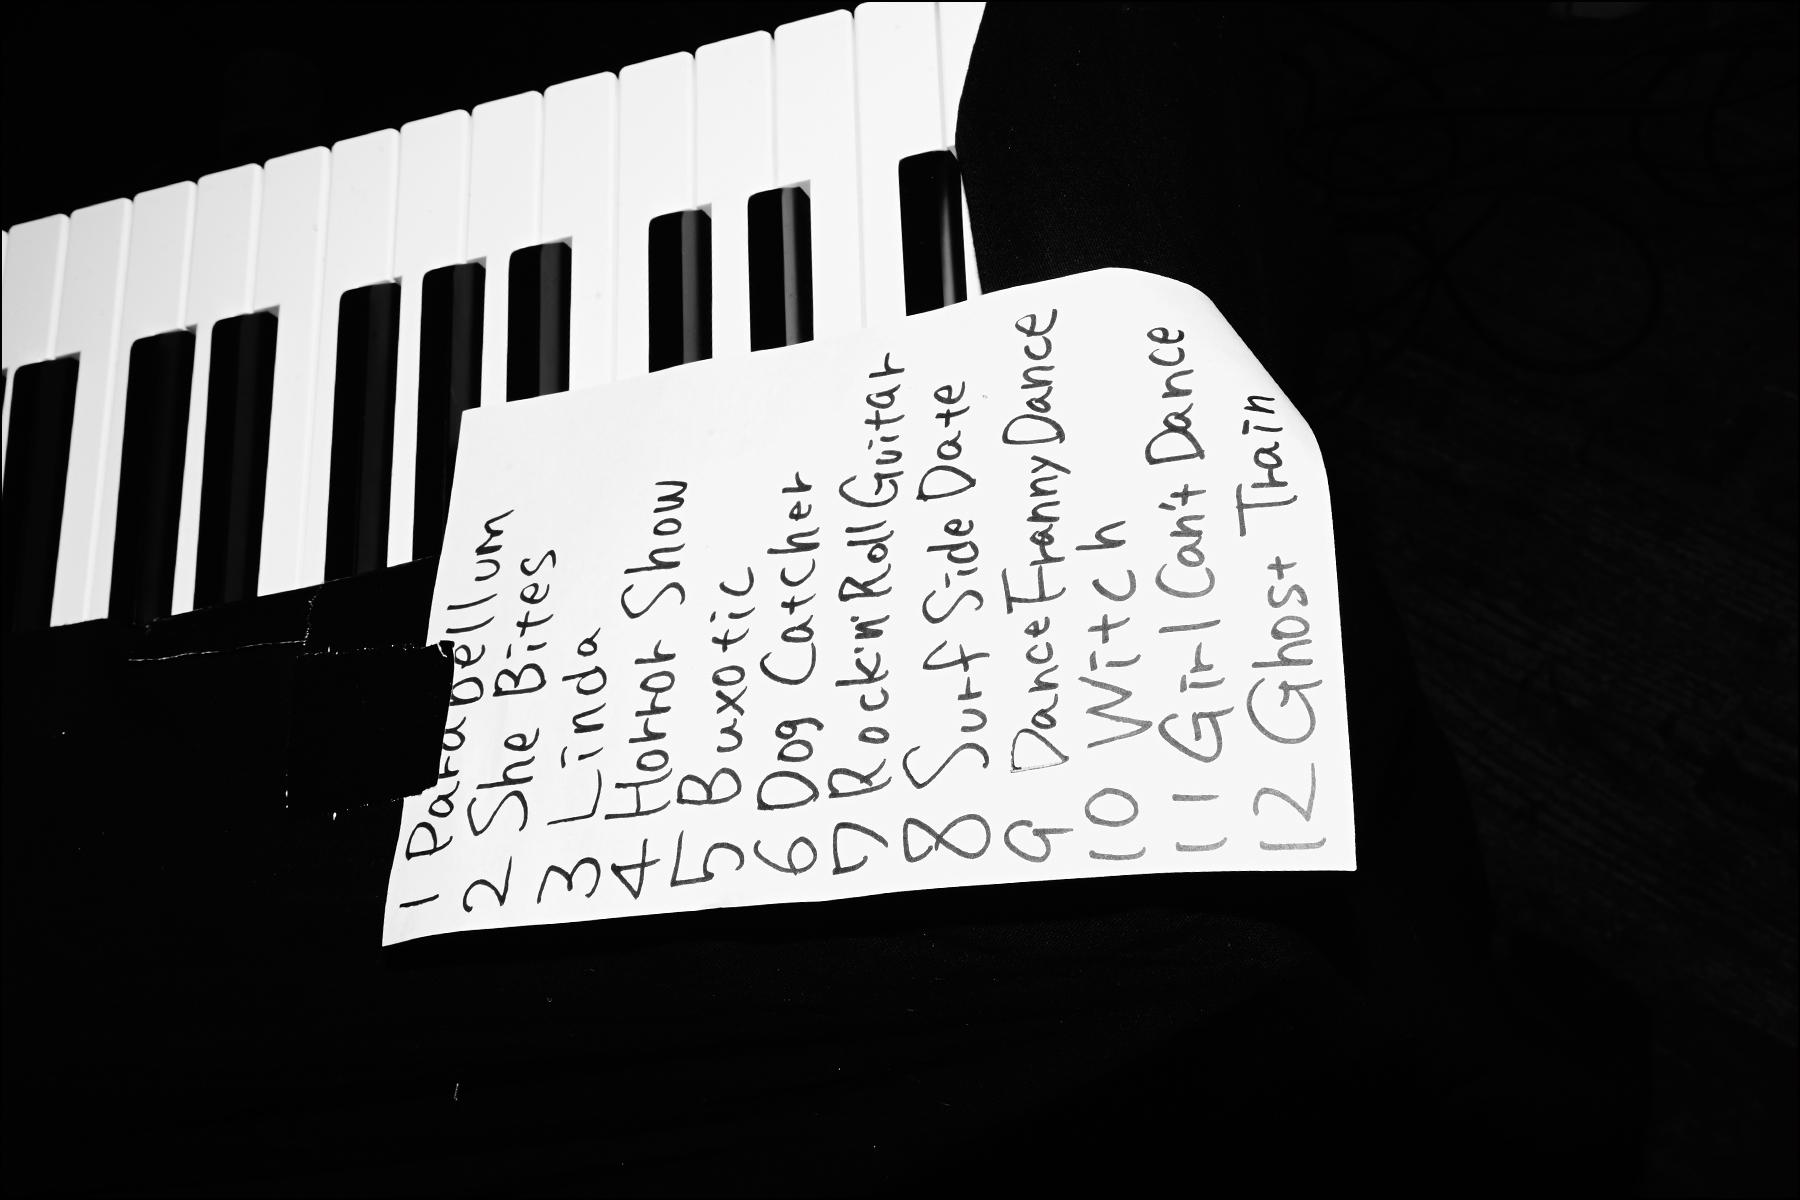 The Stompin' Riffraffs setlist. Photographed by Alexander Thompson for Ponyboy magazine NY.